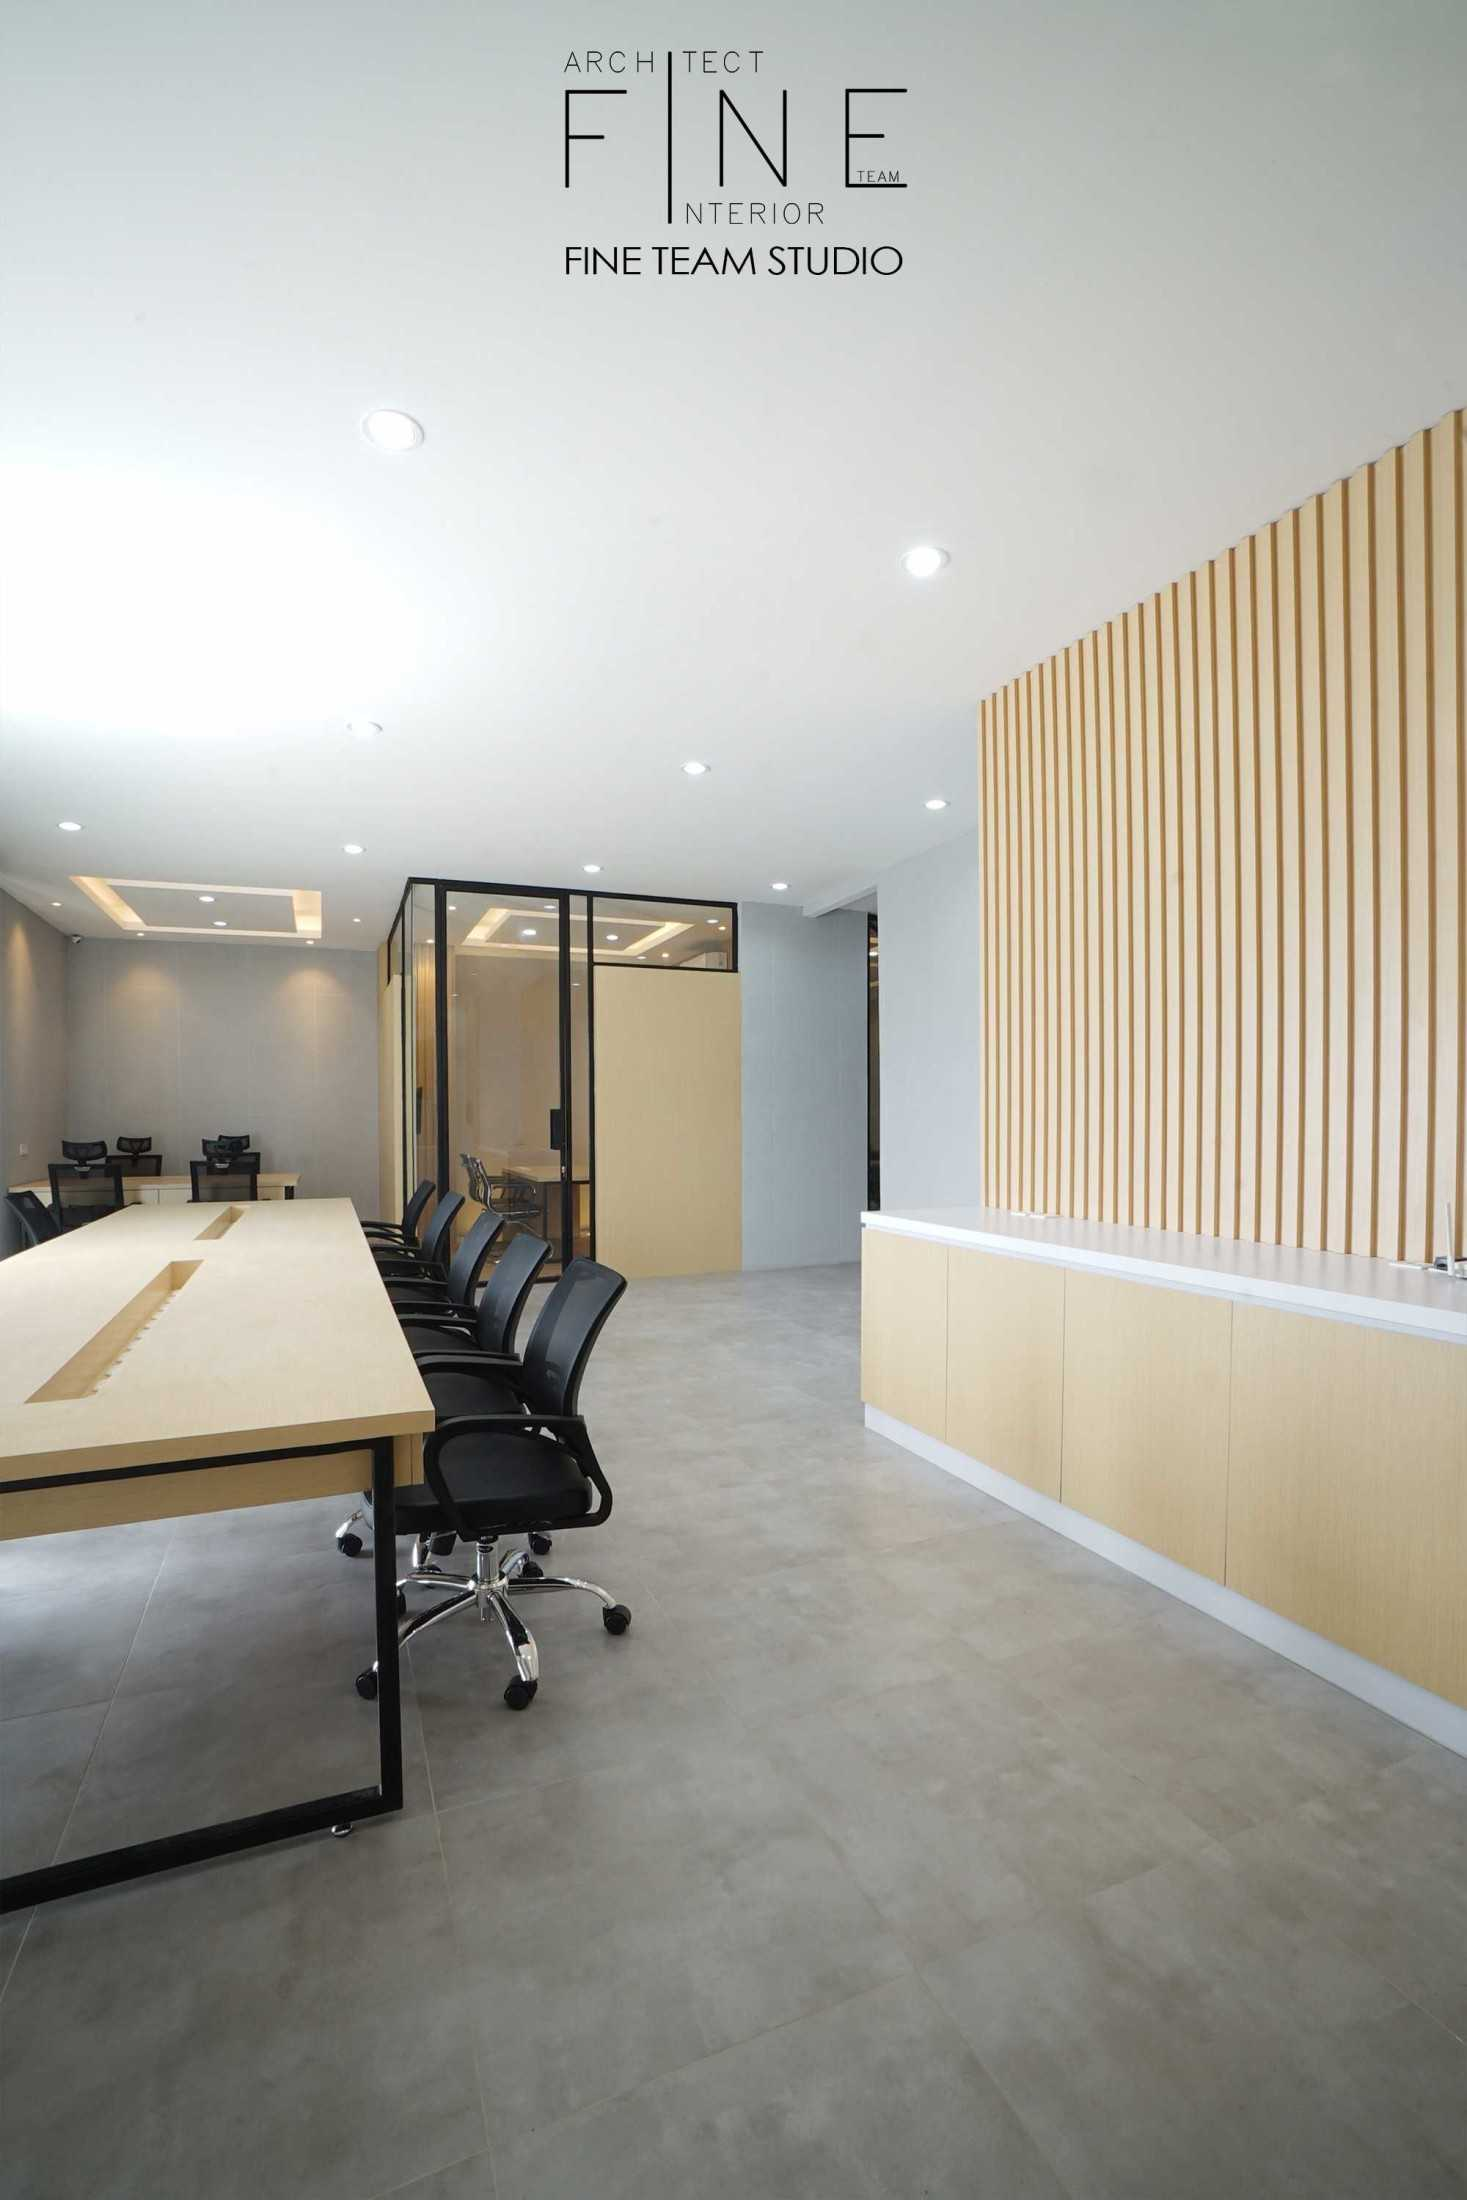 Fine Team Studio Mob Office Cikupa, Tangerang, Banten, Indonesia Cikupa, Tangerang, Banten, Indonesia Fine-Team-Studio-Mob-Office  71141